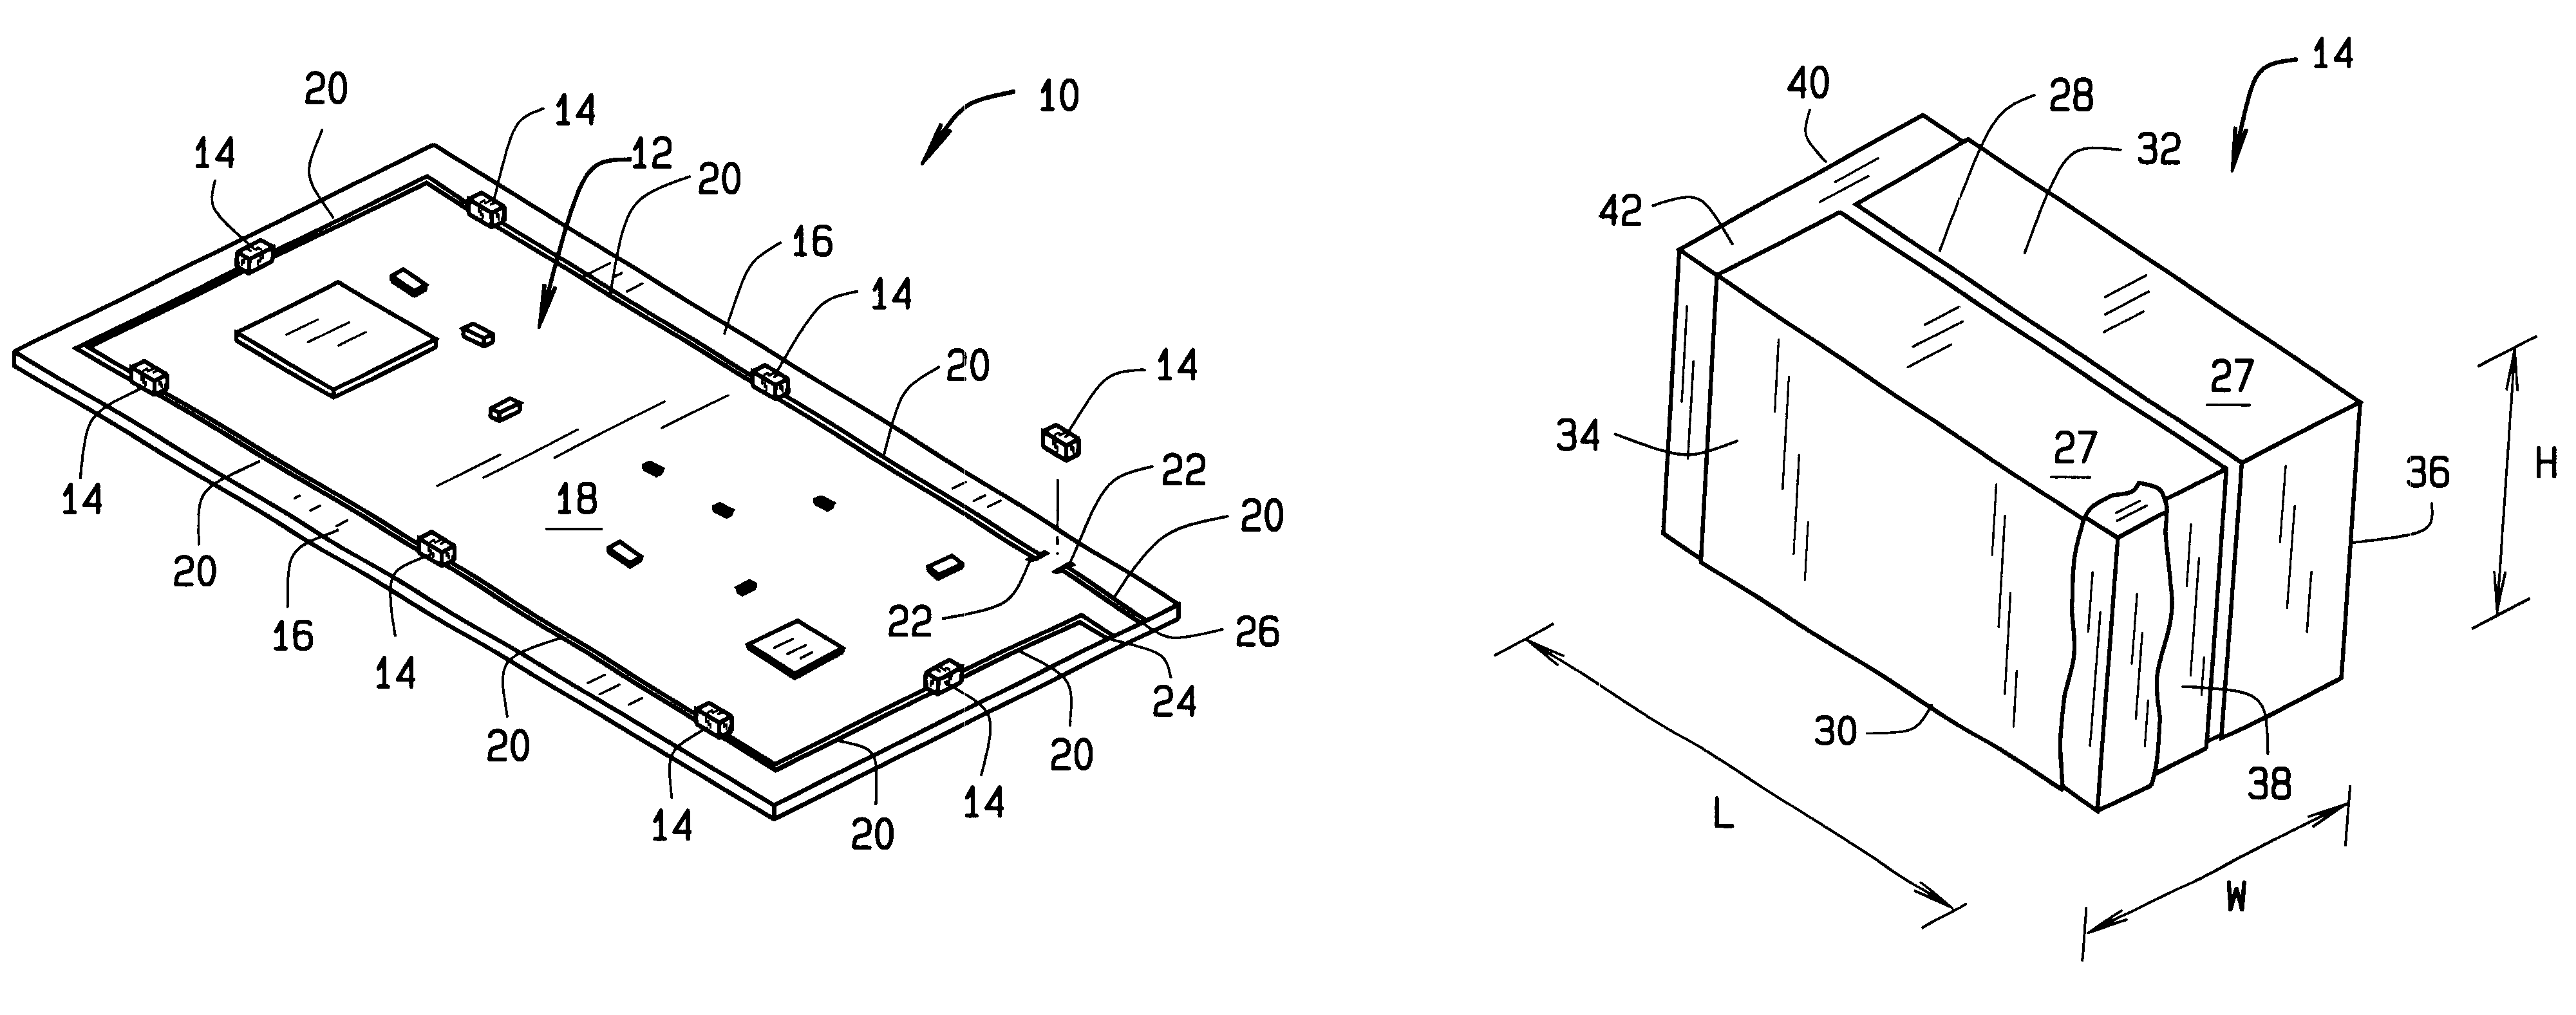 printedcircuitboardassemblylarge